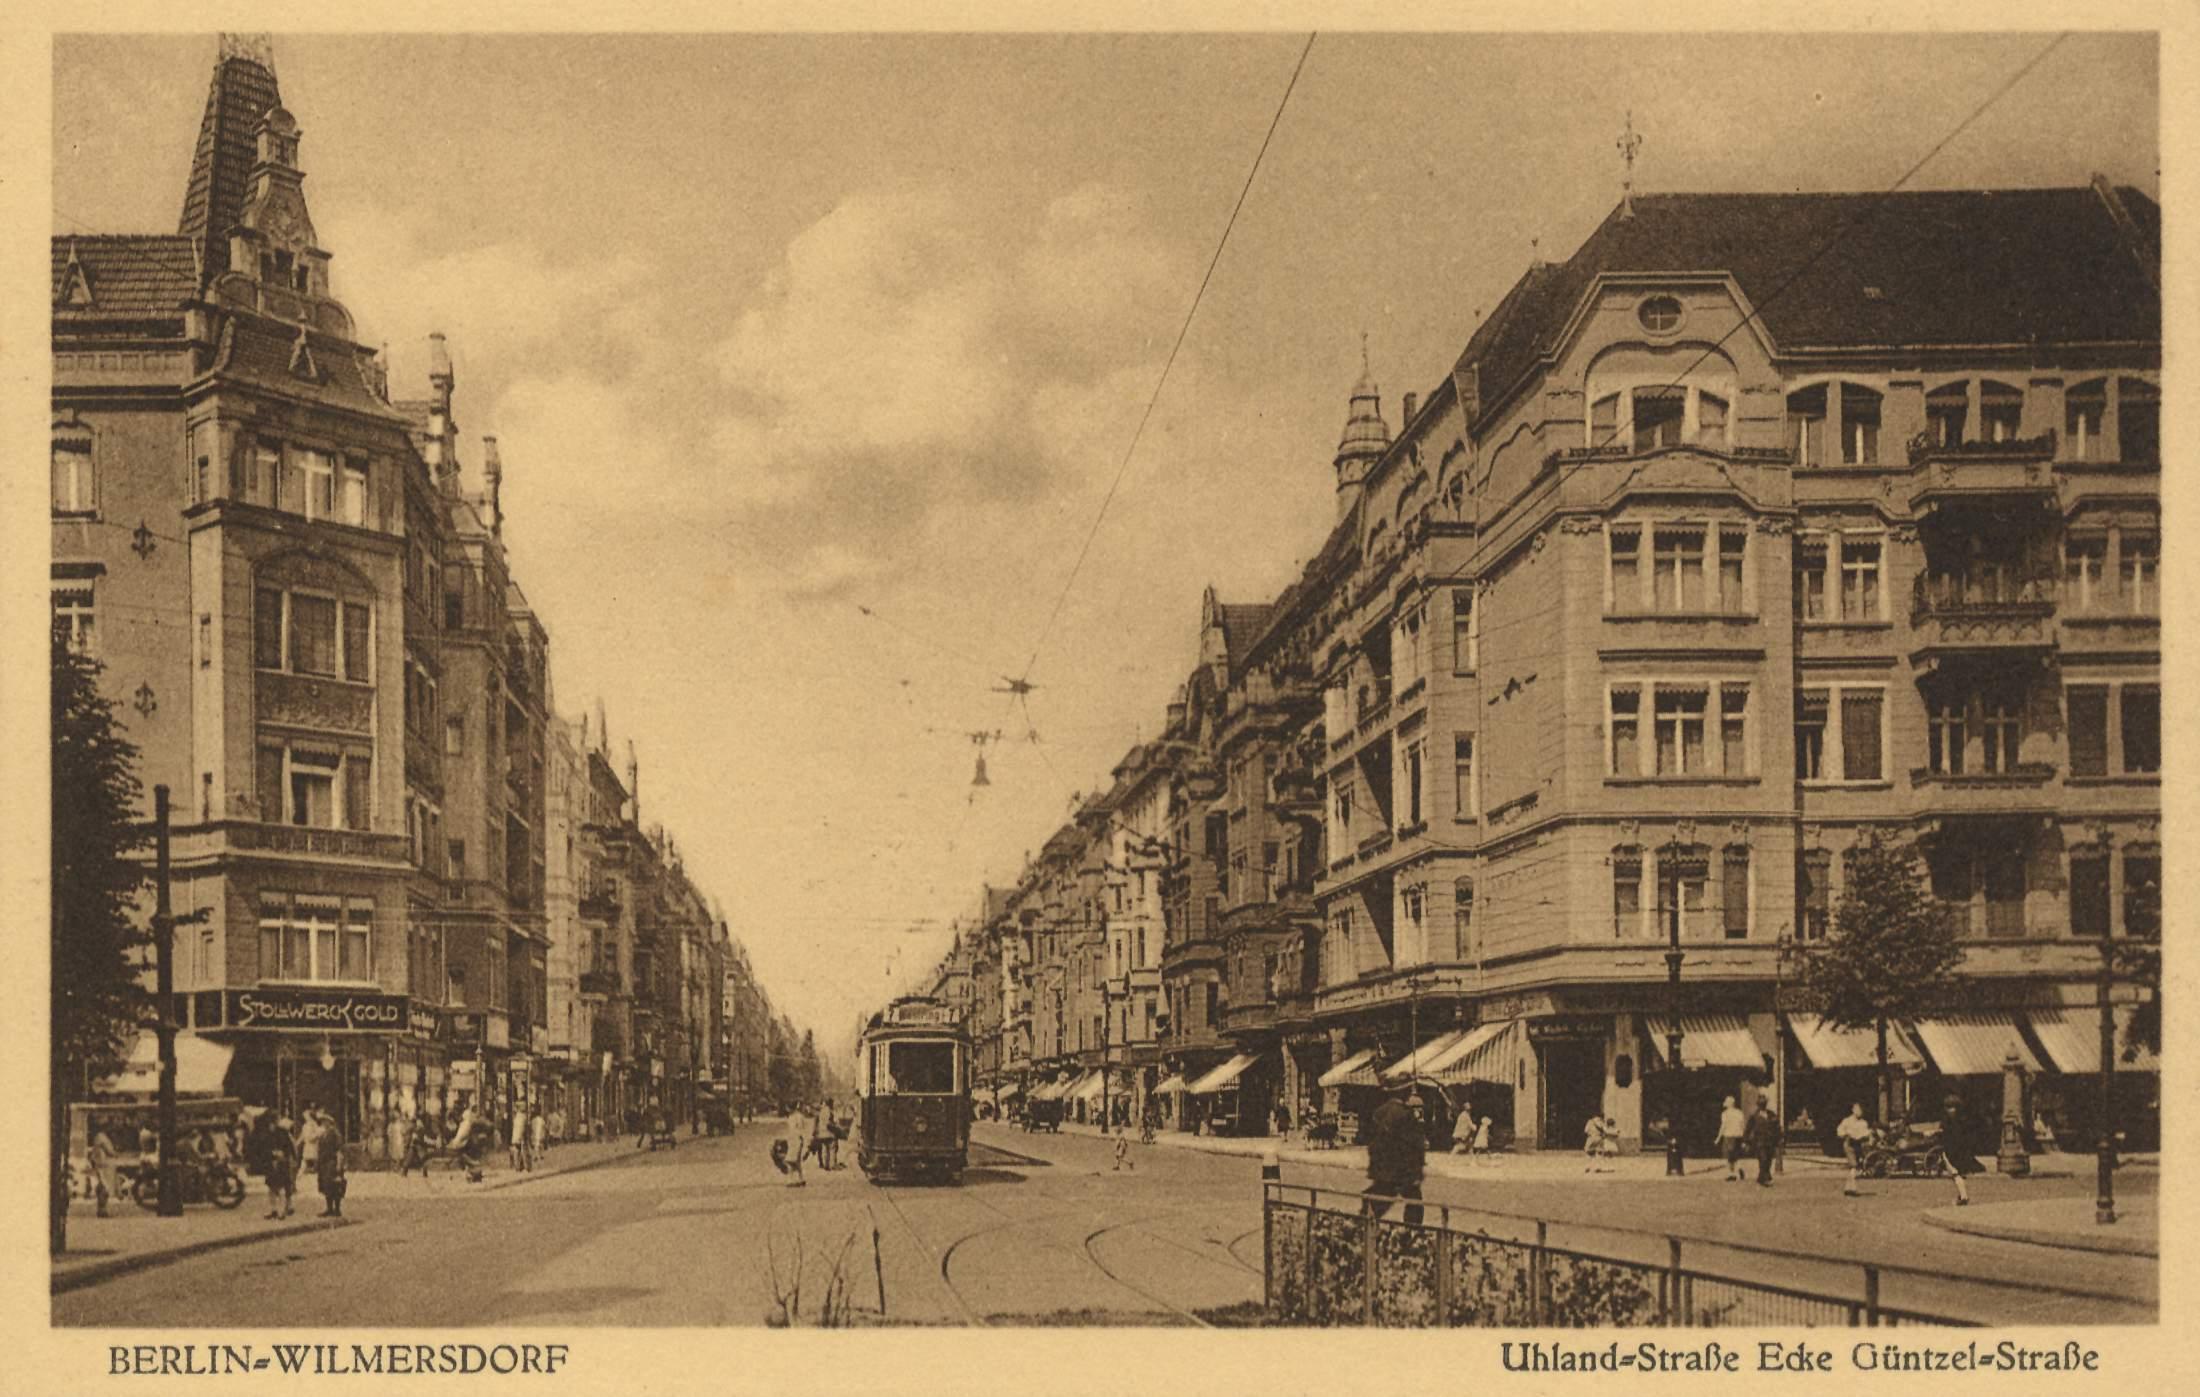 Berlin, Wilmersdorf, Berlin, Uhlandstraße Ecke